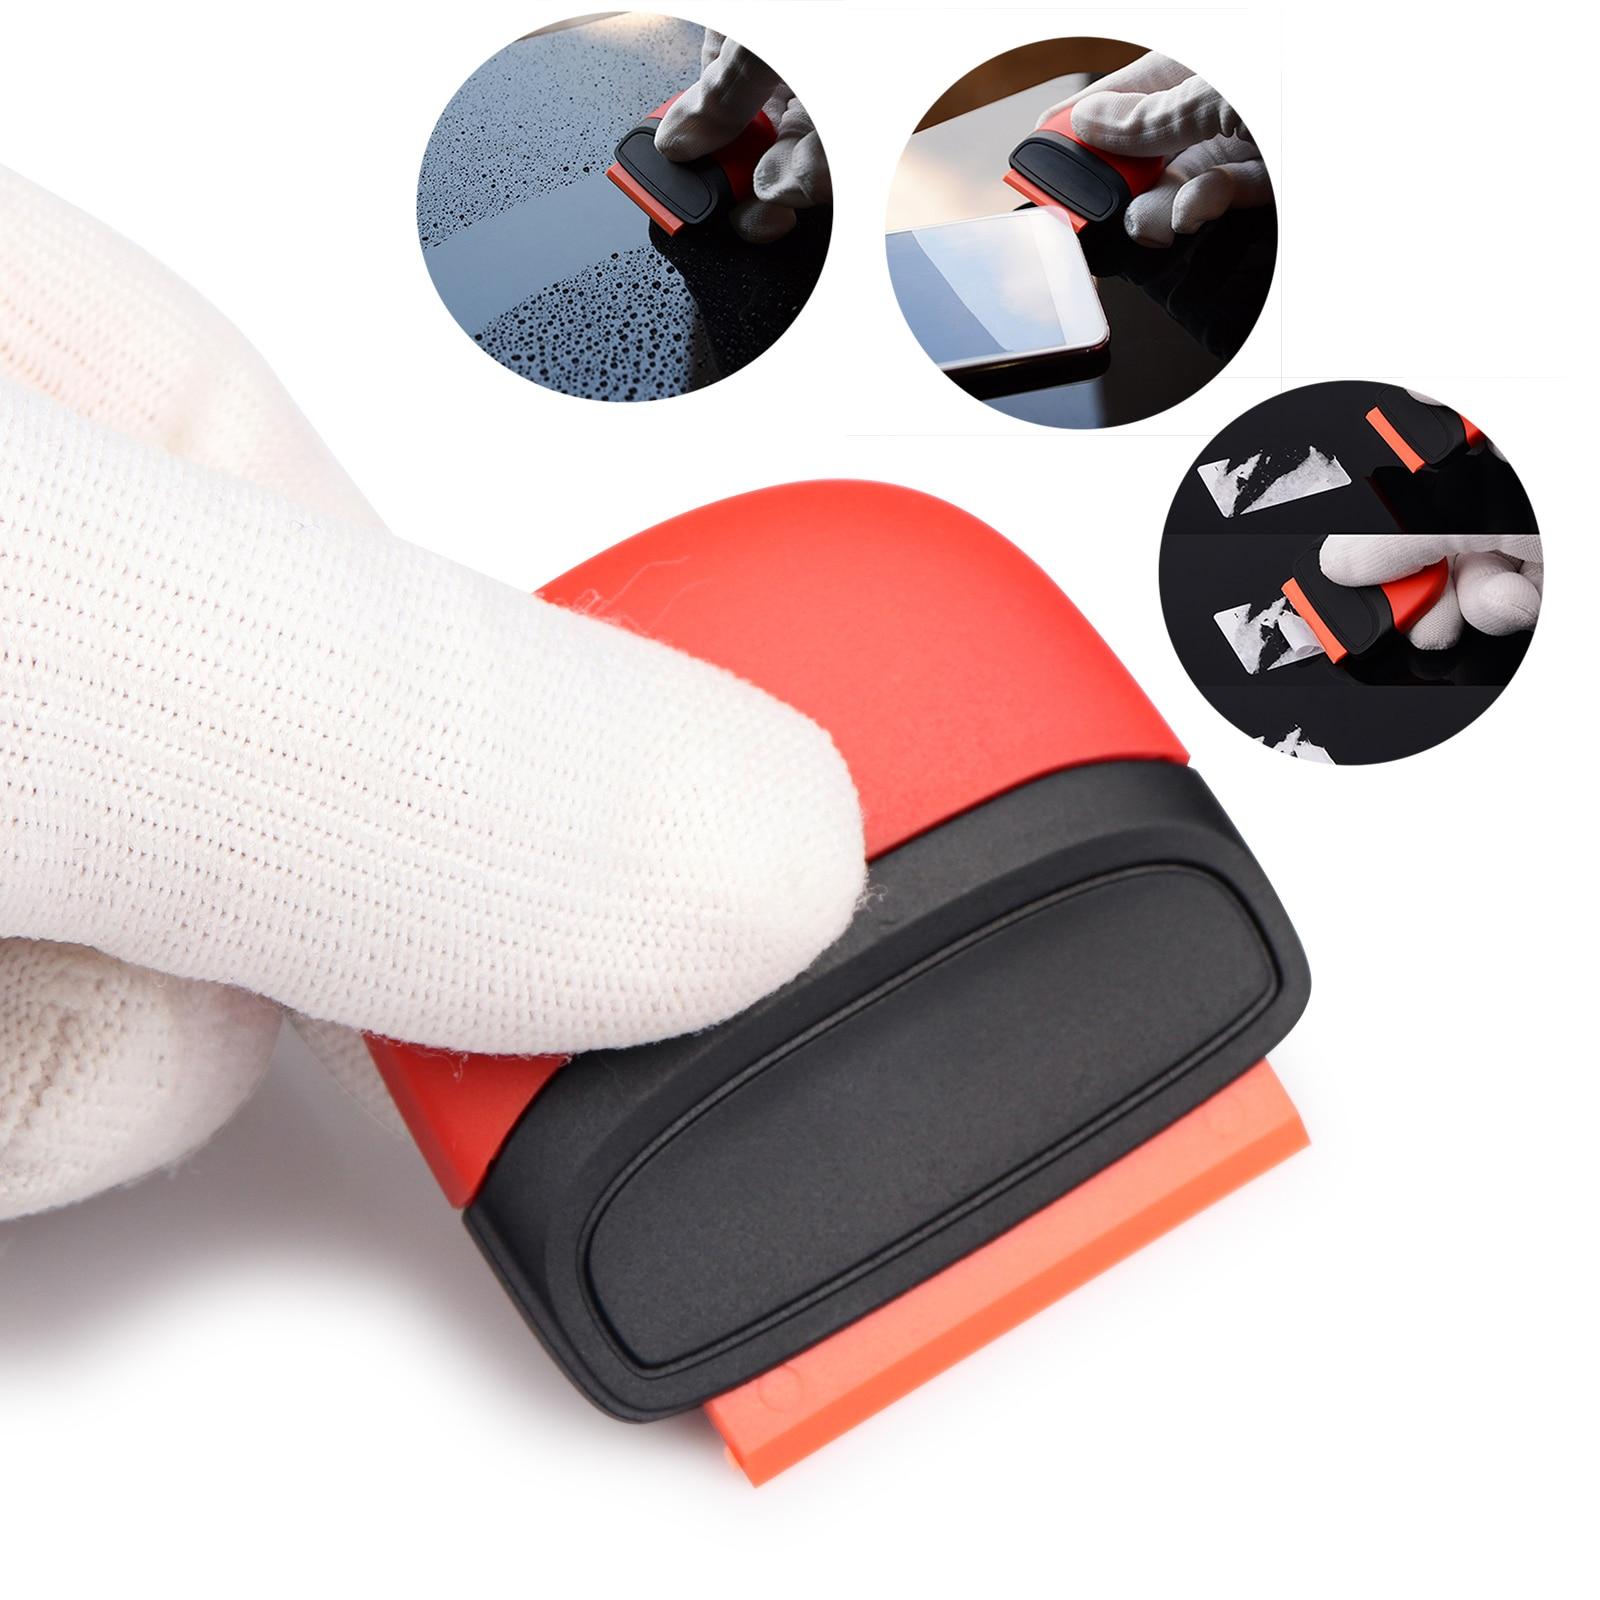 FOSHIO Car Tools Razor Scraper Carbon Fiber Vinyl Sticker Remover Wrap Squeegee Scraper Auto Wrapping Foil Film Car Accessories